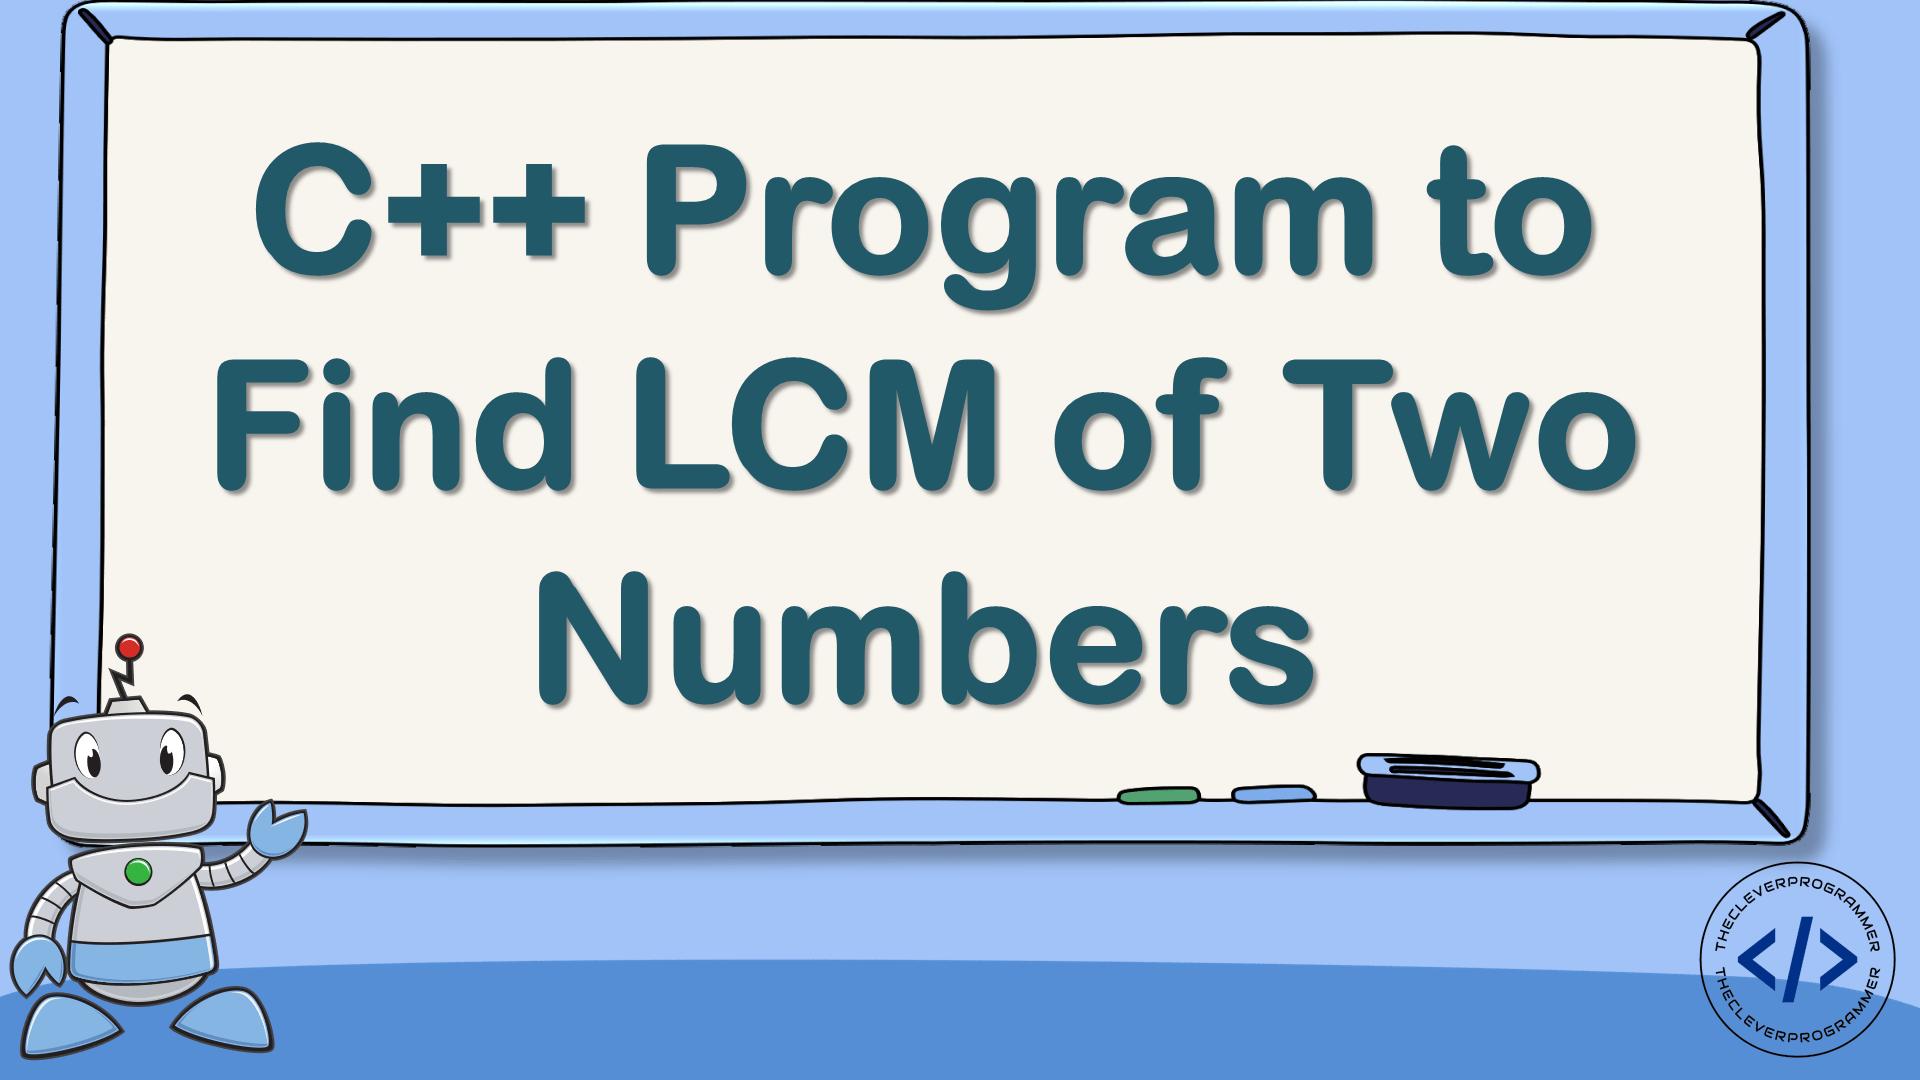 C++ Program to Find LCM